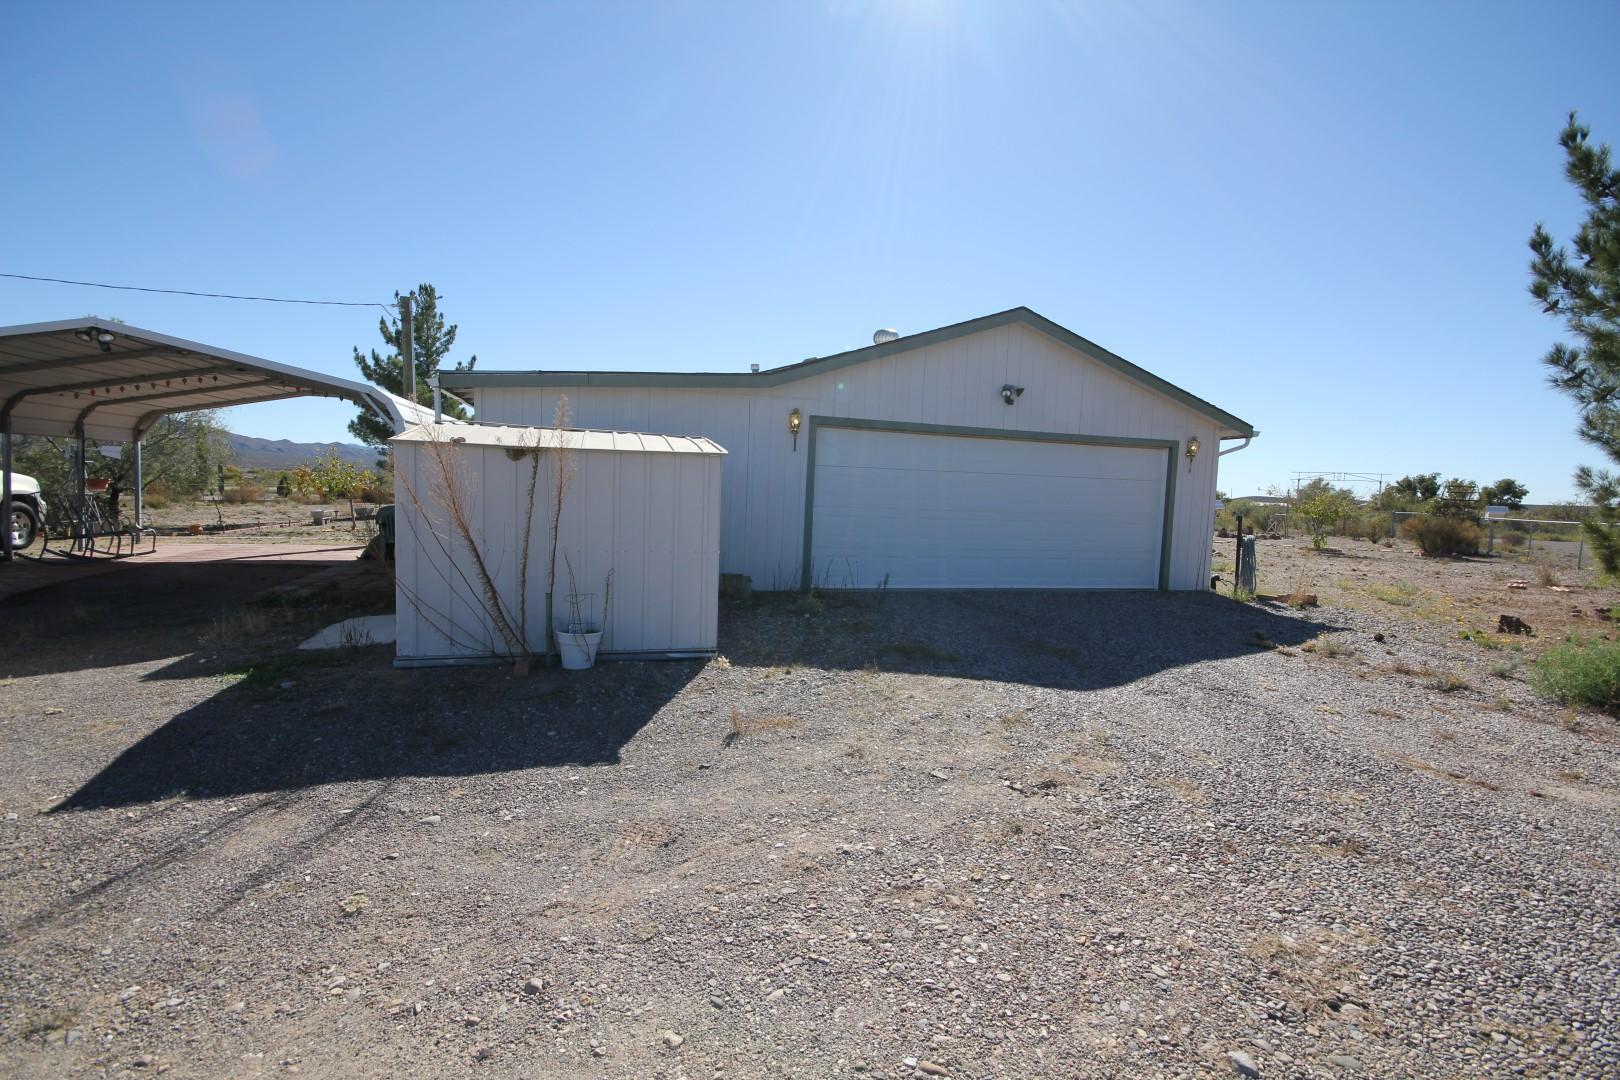 484 Apache Rd, Arrey, New Mexico 87930